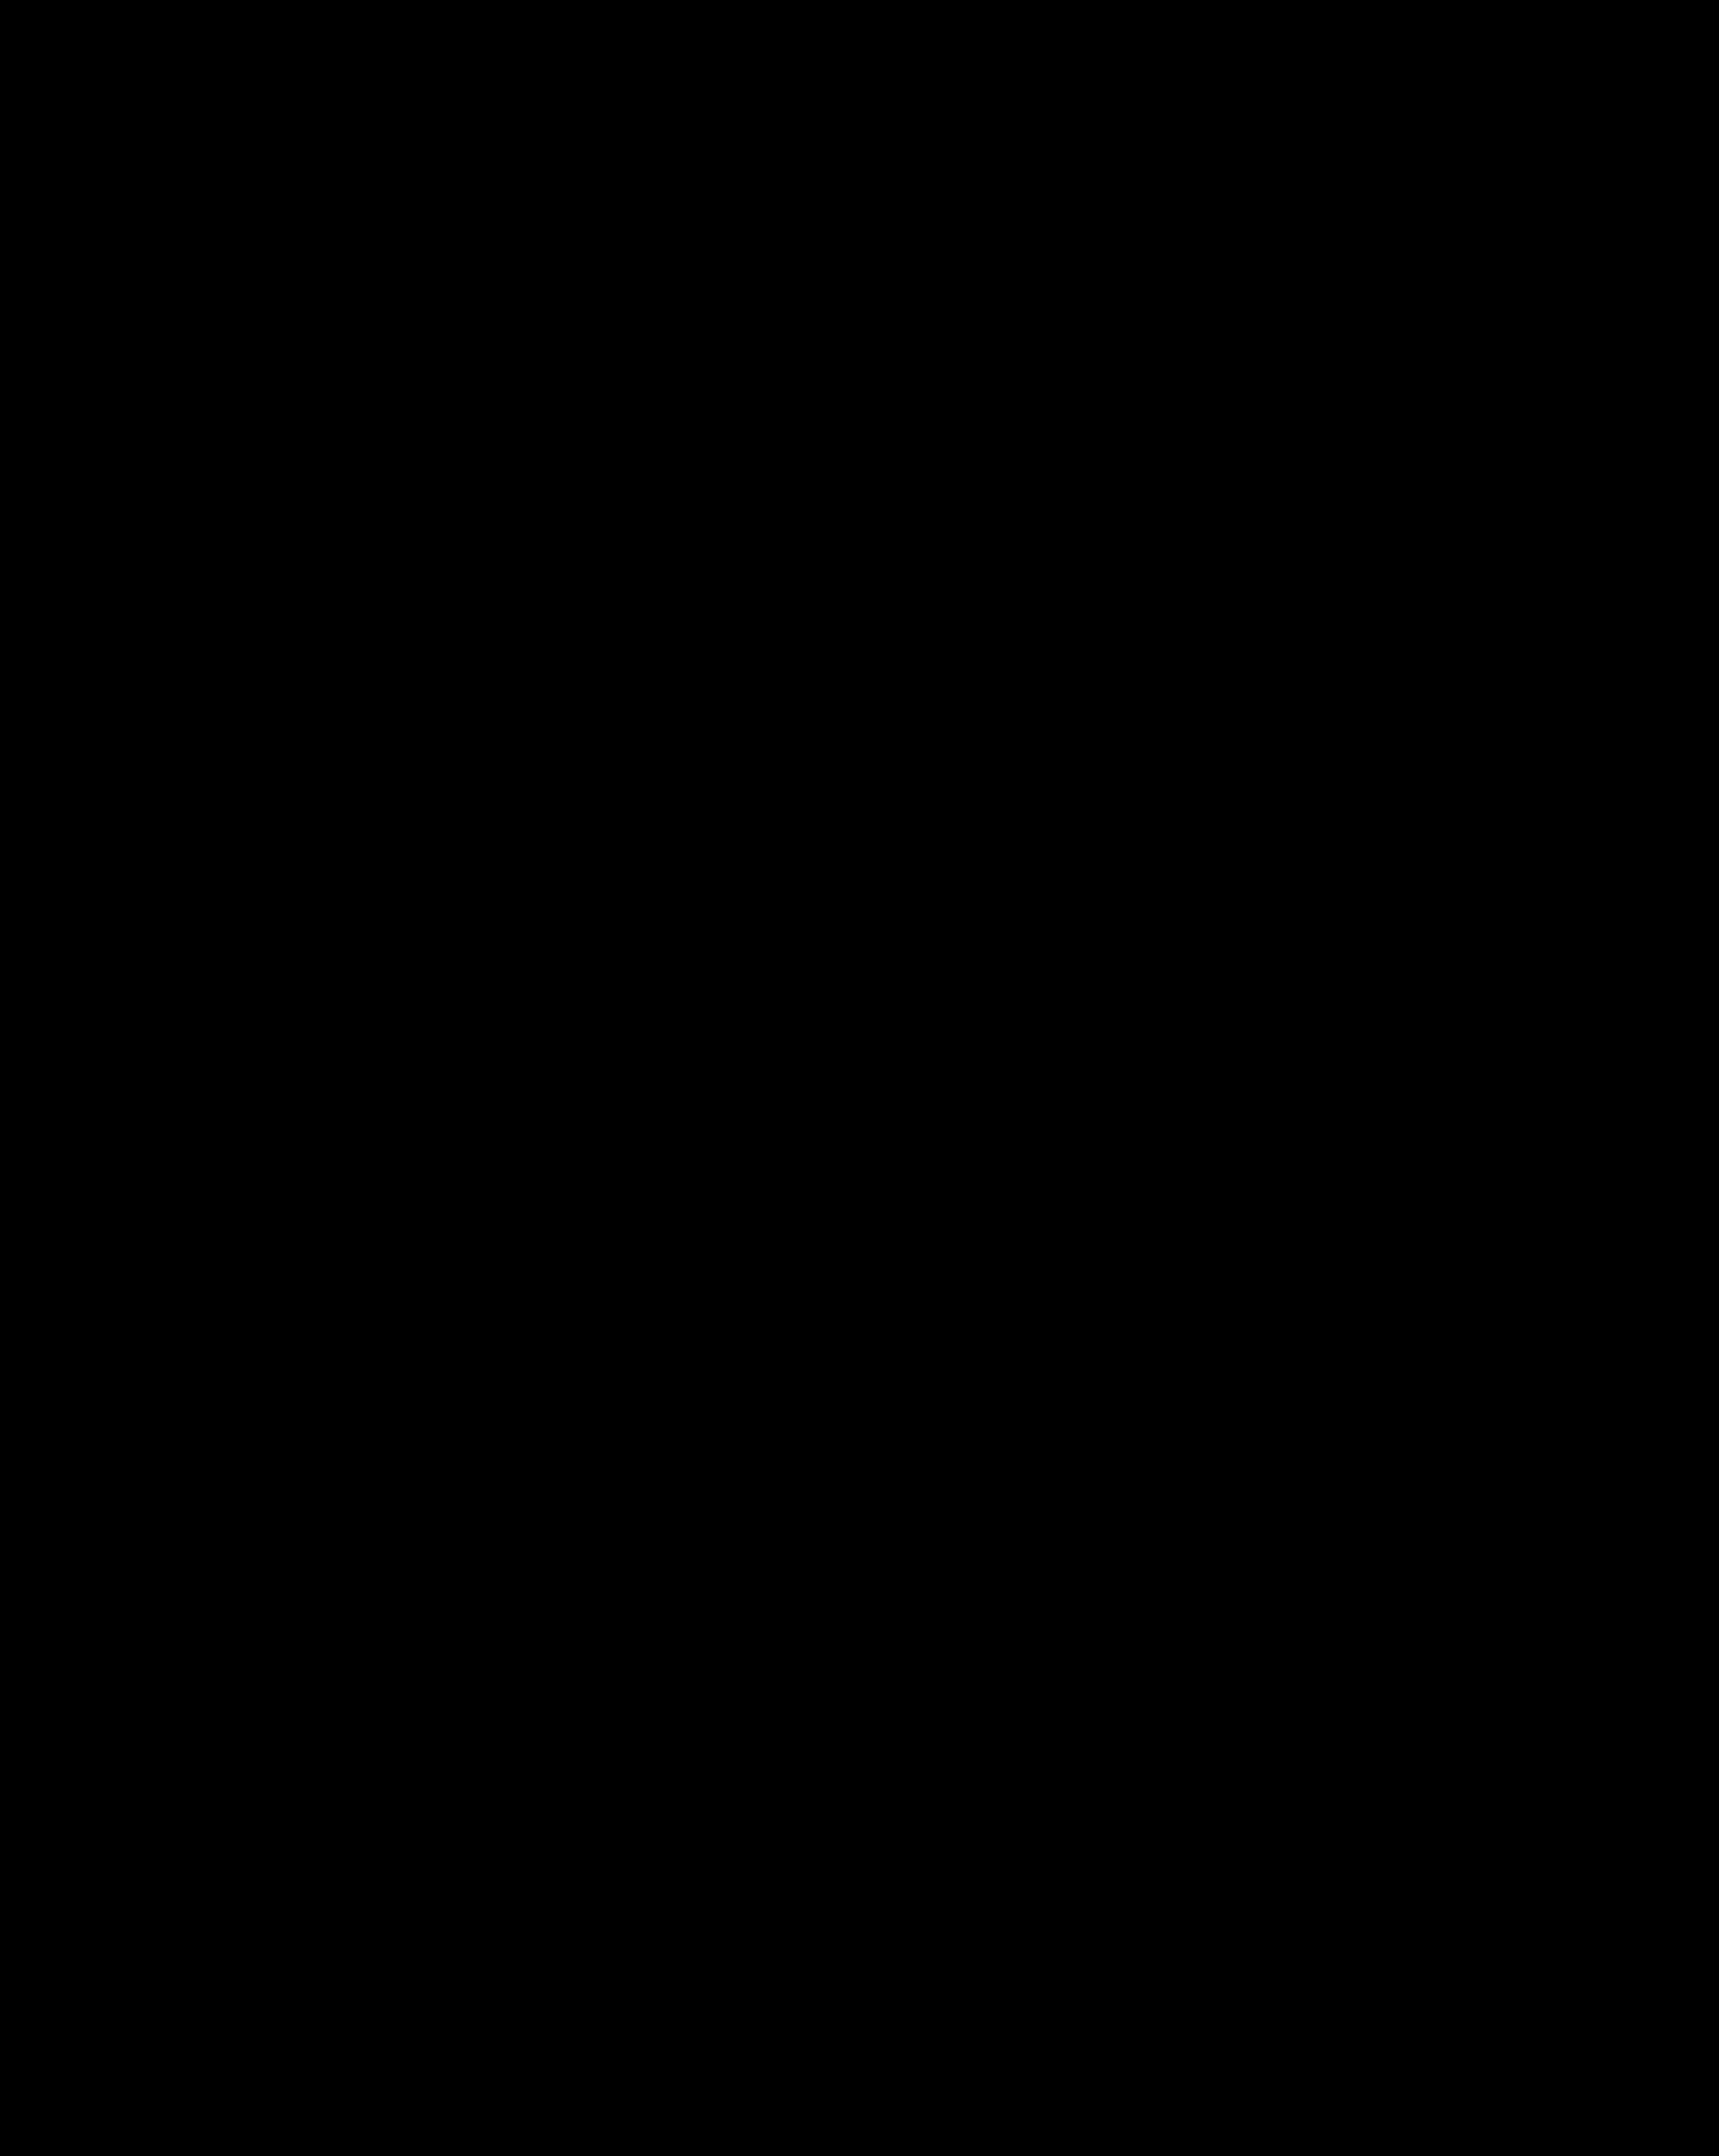 image black and white Egypt drawing. Clipart egyptian god amon